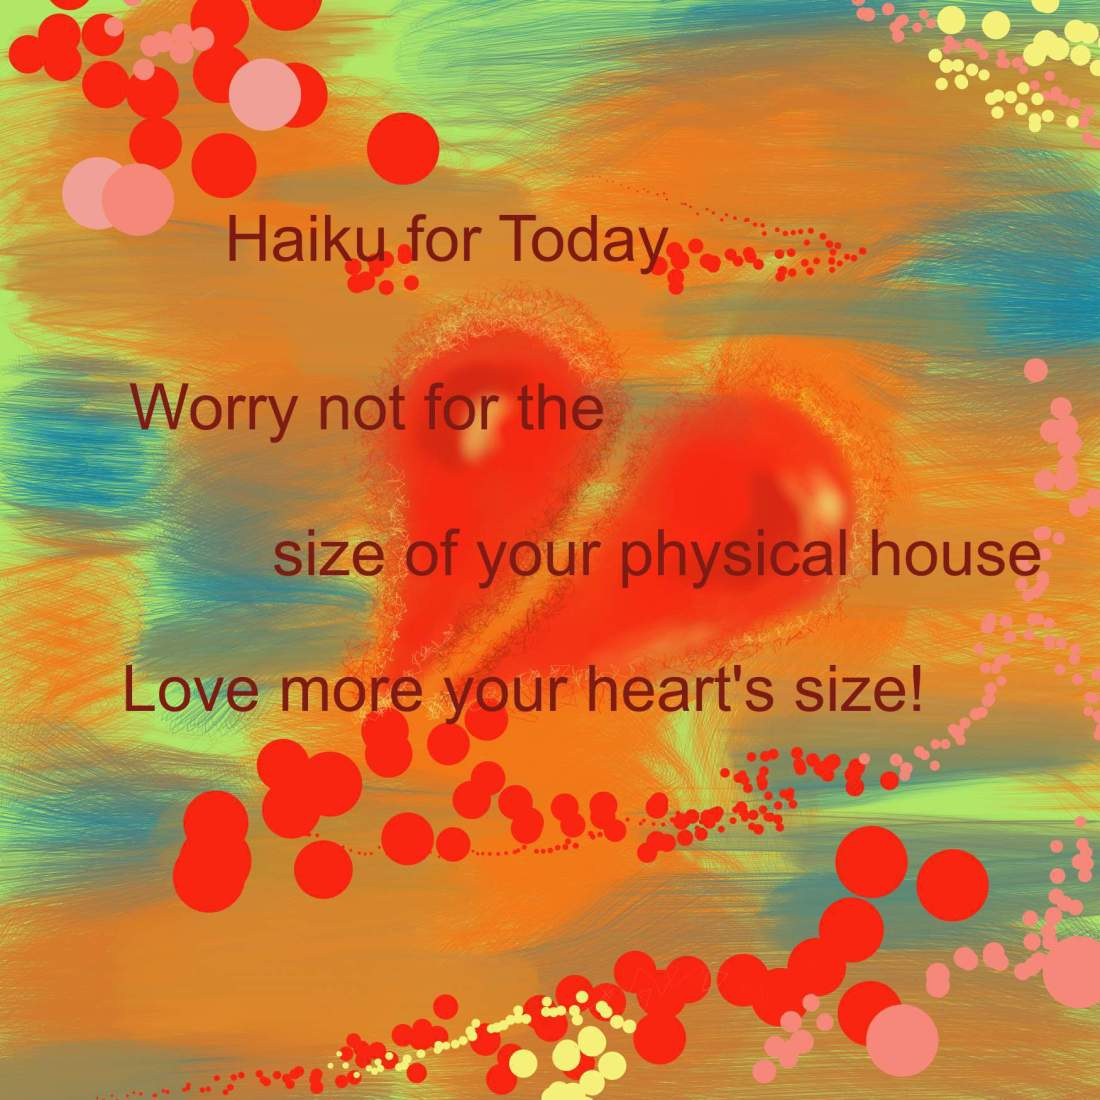 haikubrokenheart